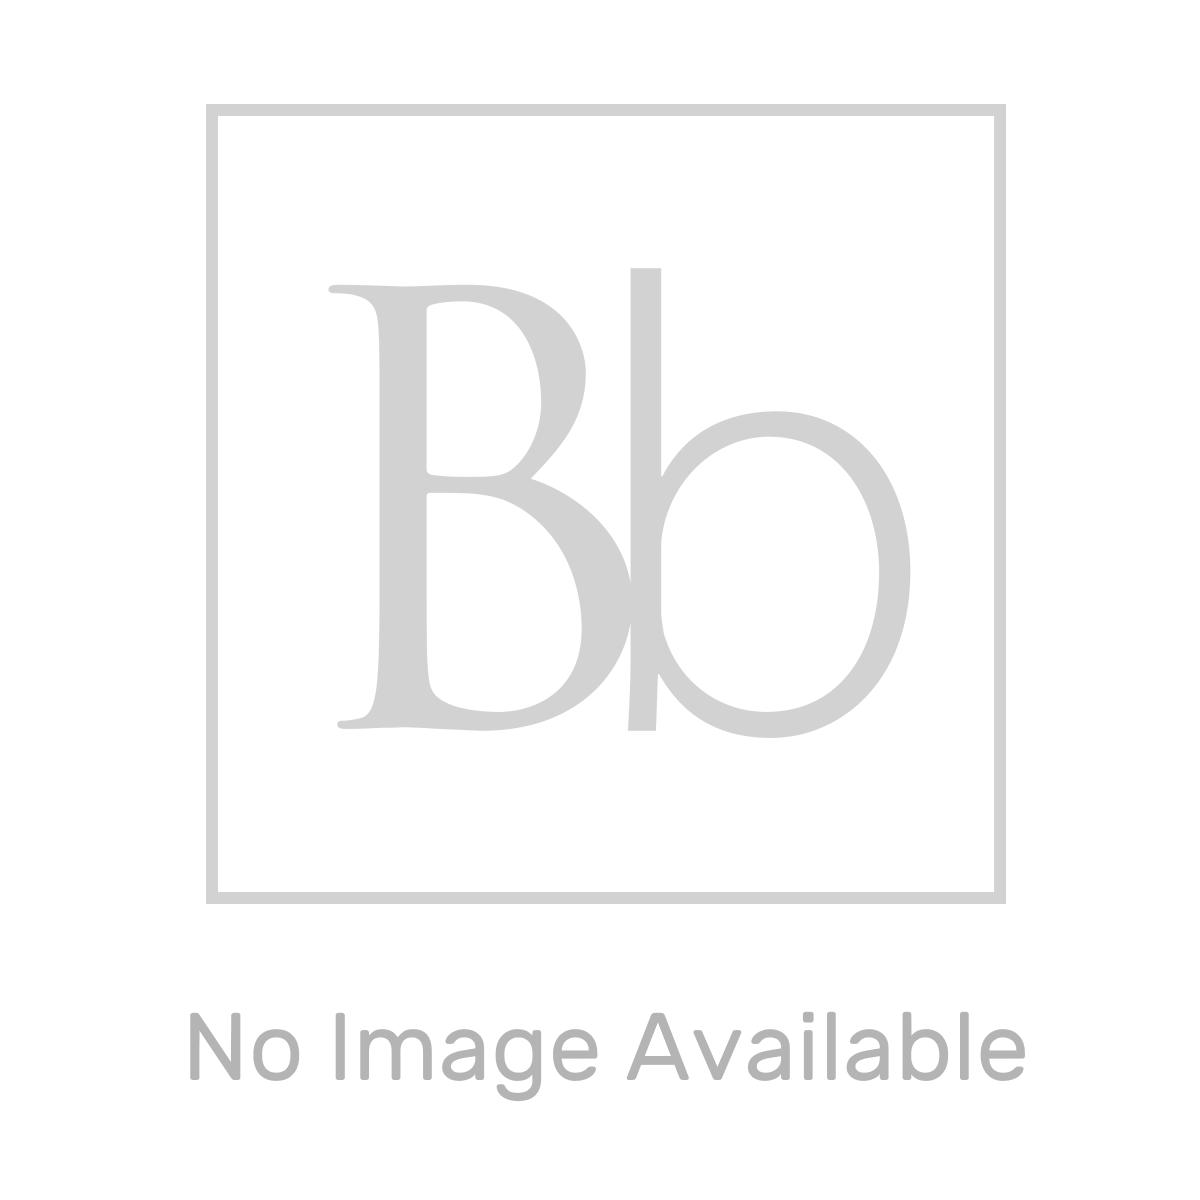 April Black Slate Shower Tray 1400 x 760 Line Drawing